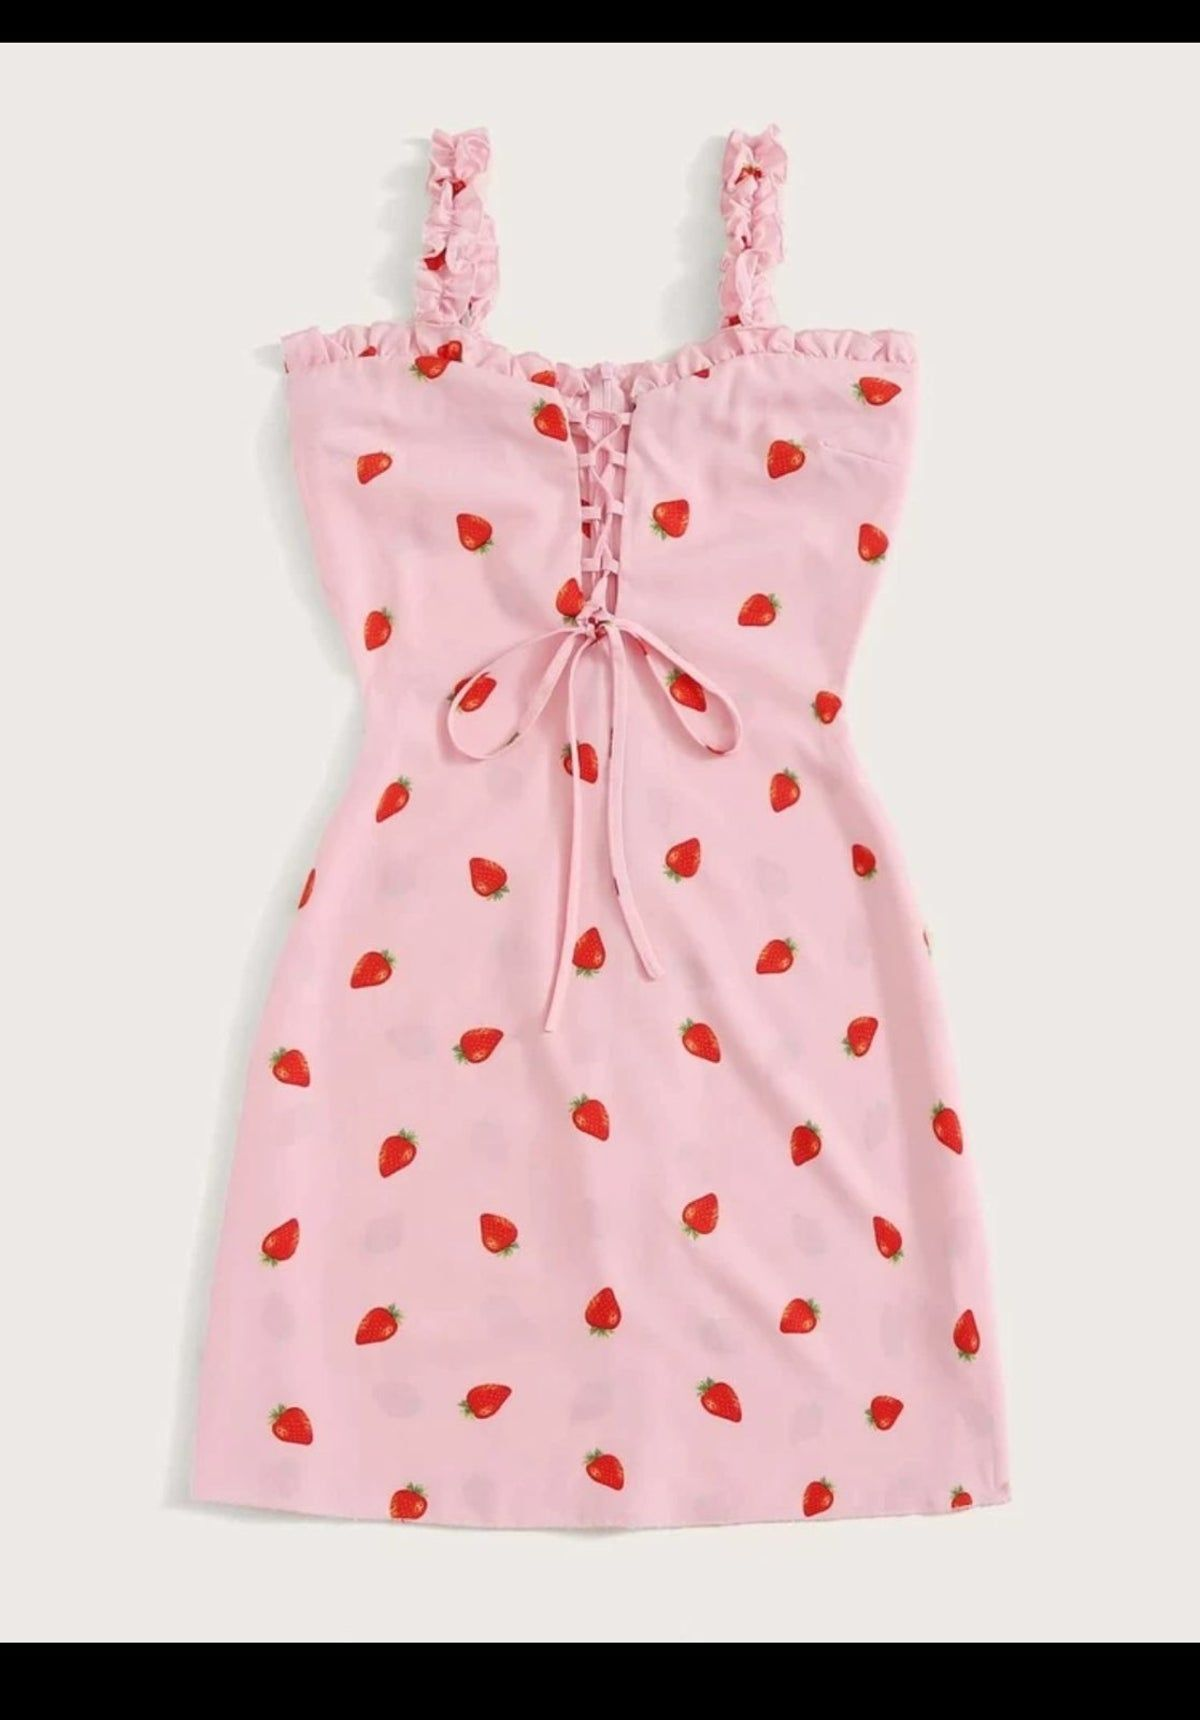 Strawberry Dress Fashion Girls Fashion Clothes Kawaii Fashion Outfits [ 1720 x 1200 Pixel ]